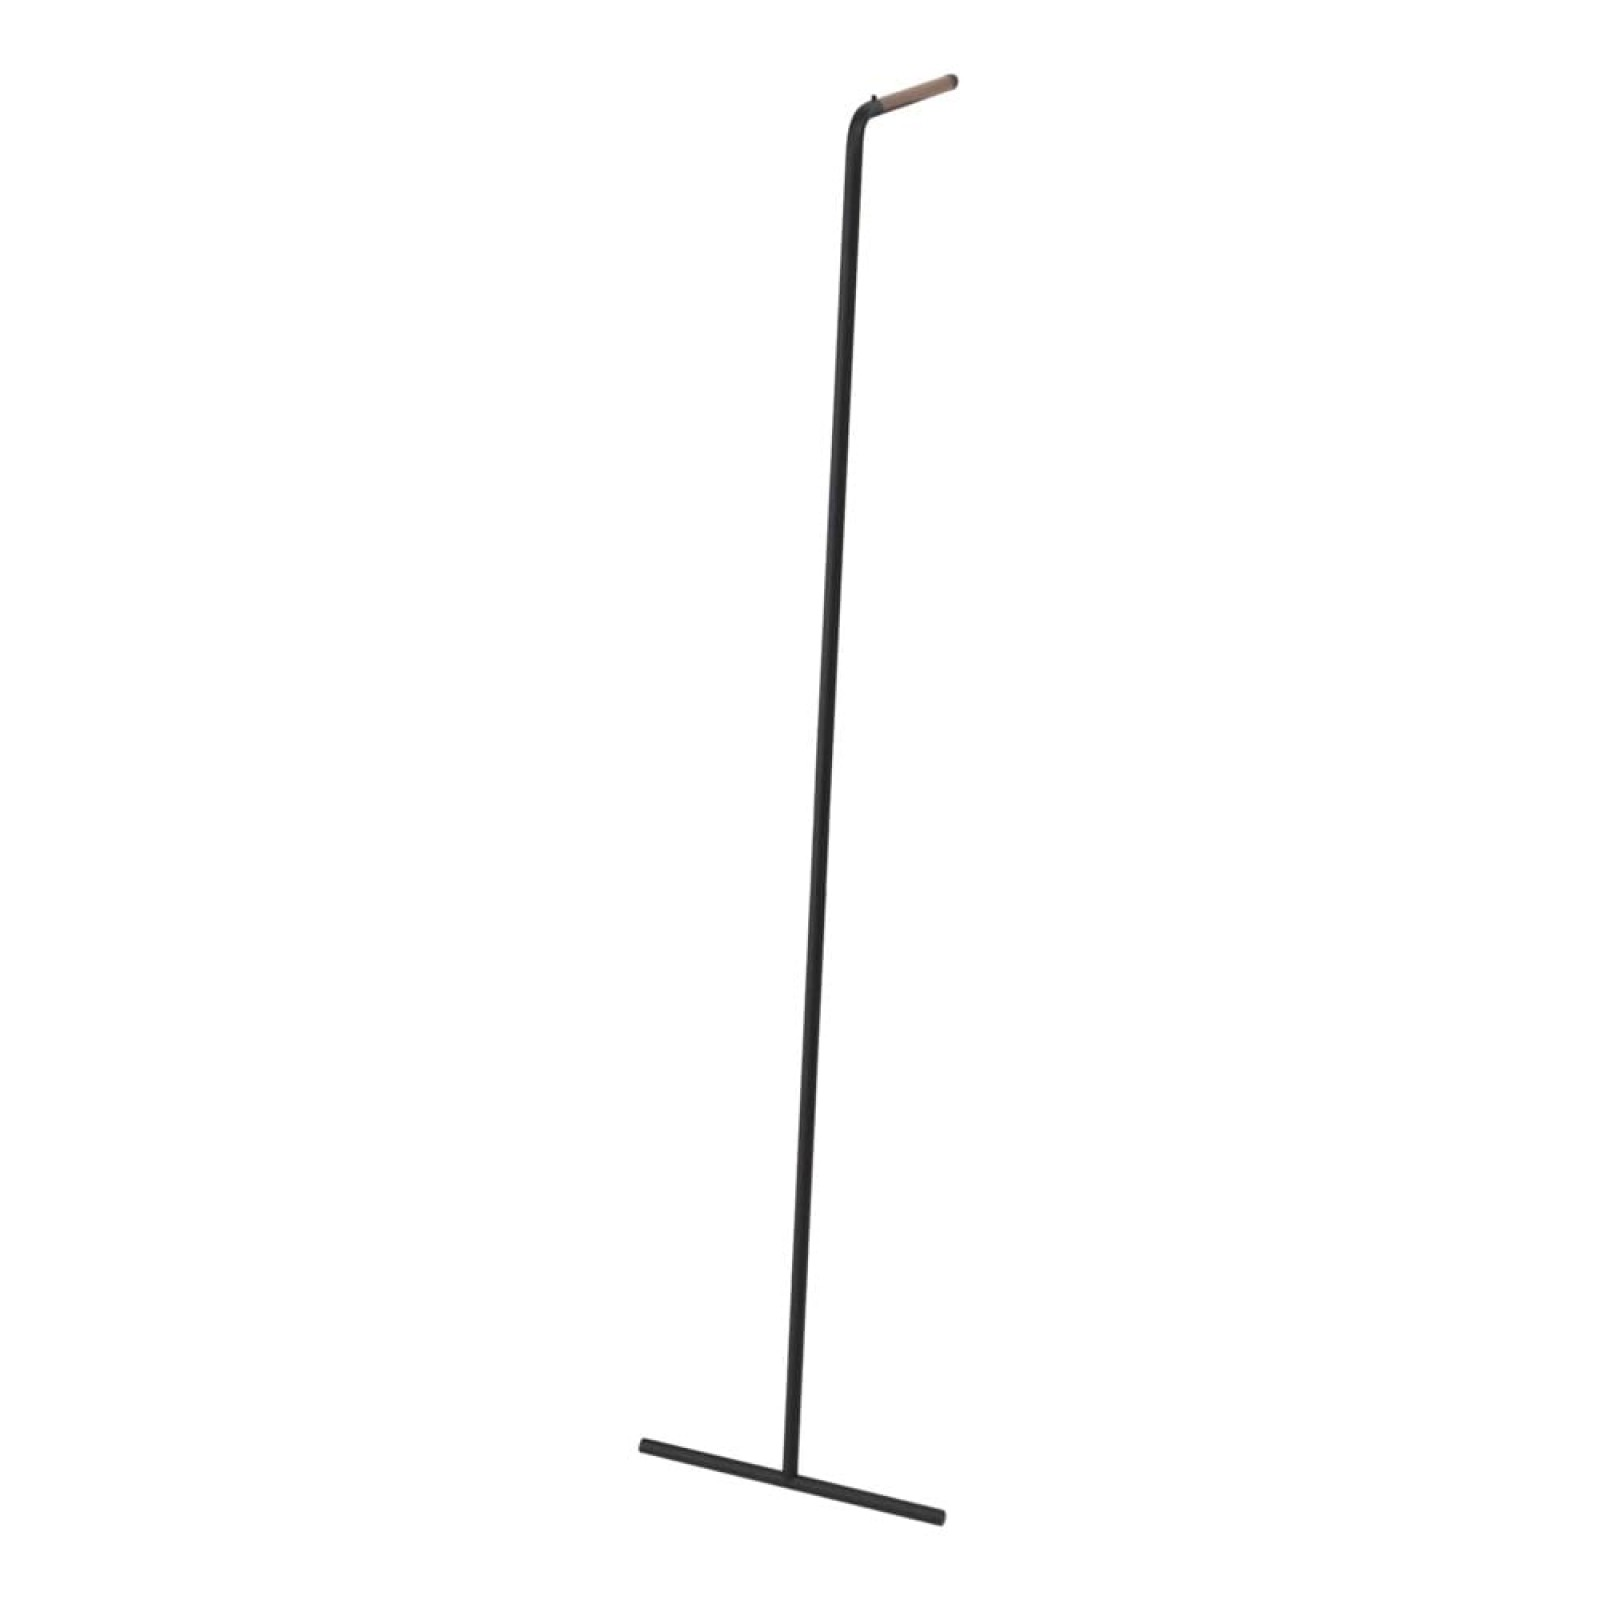 Tower Slim Leaning Coat Rack (Black) - Yamazaki